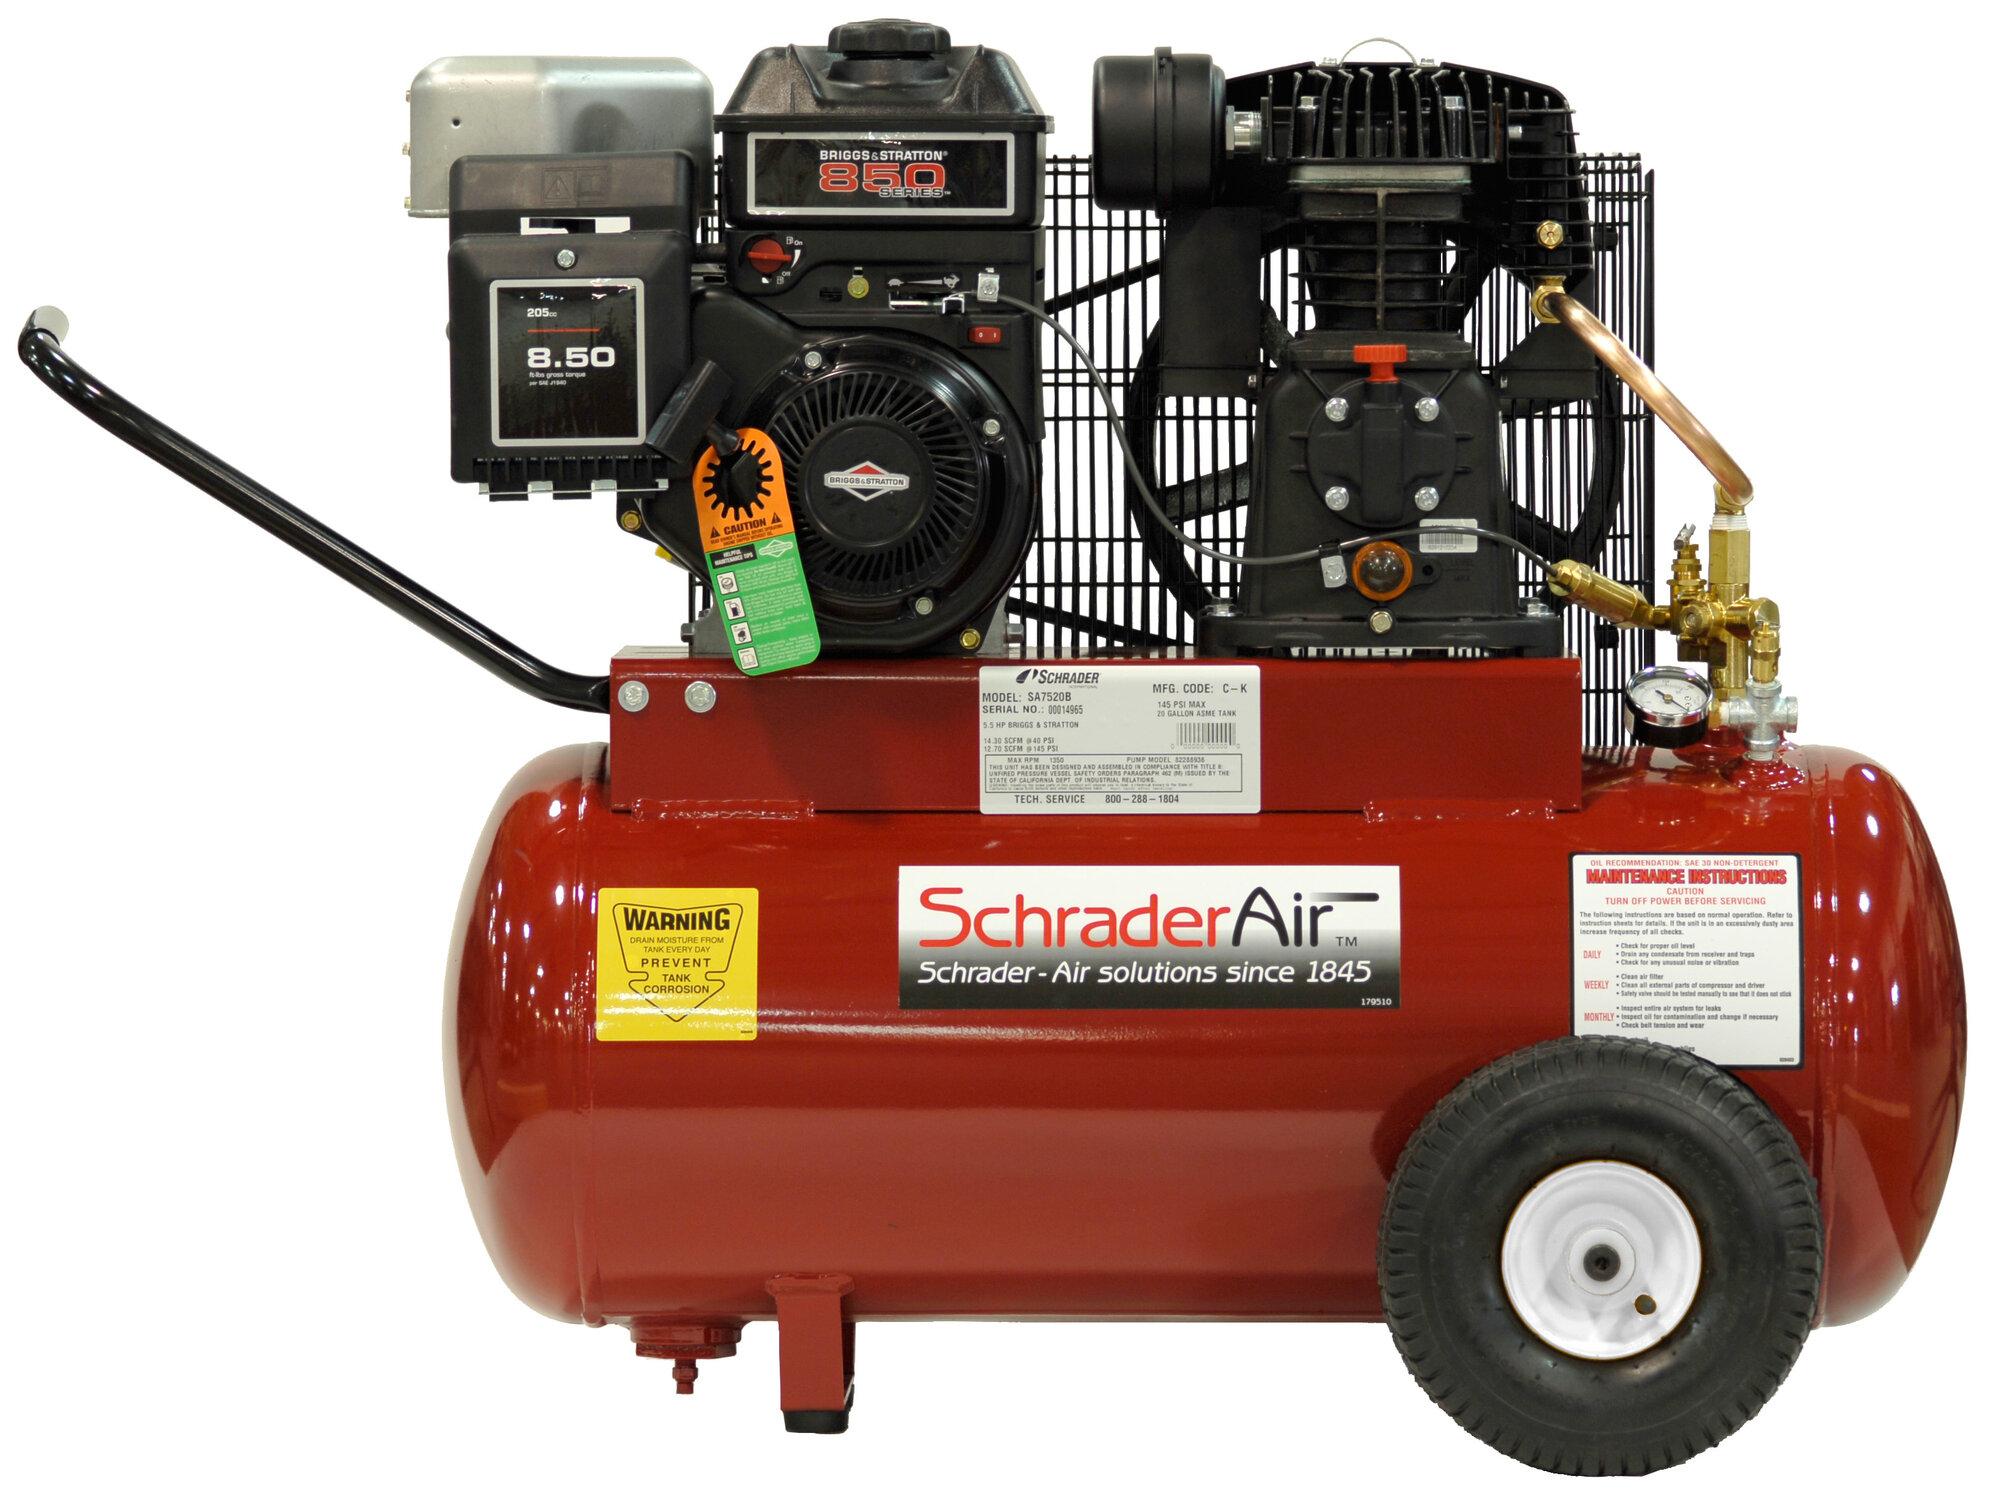 5 5 HP 20 Gallon Compressor for Contractors Gas Powered